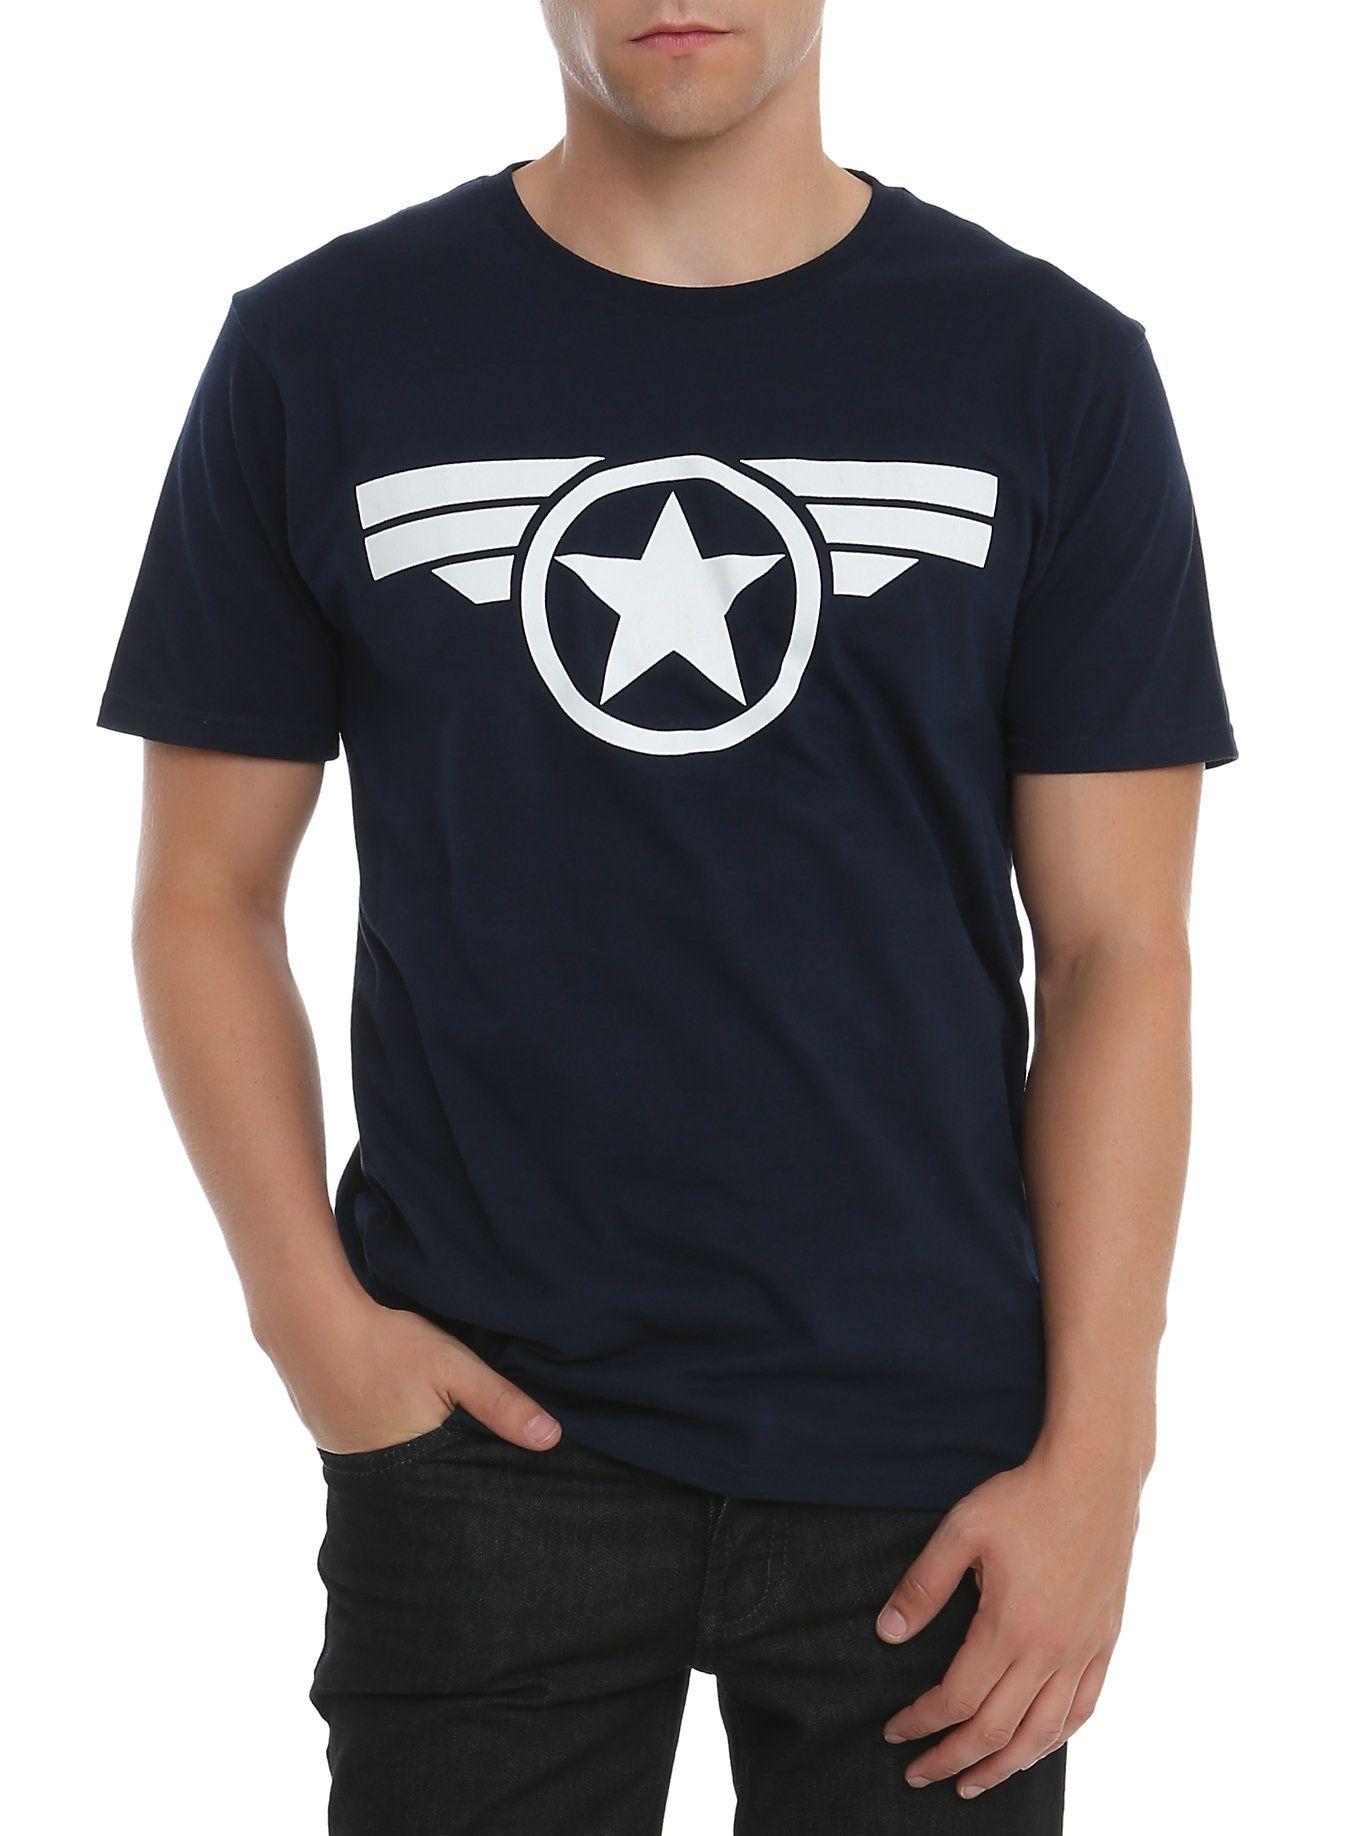 e902b2ea Marvel Captain America: The Winter Soldier Logo T-Shirt | Hot Topic